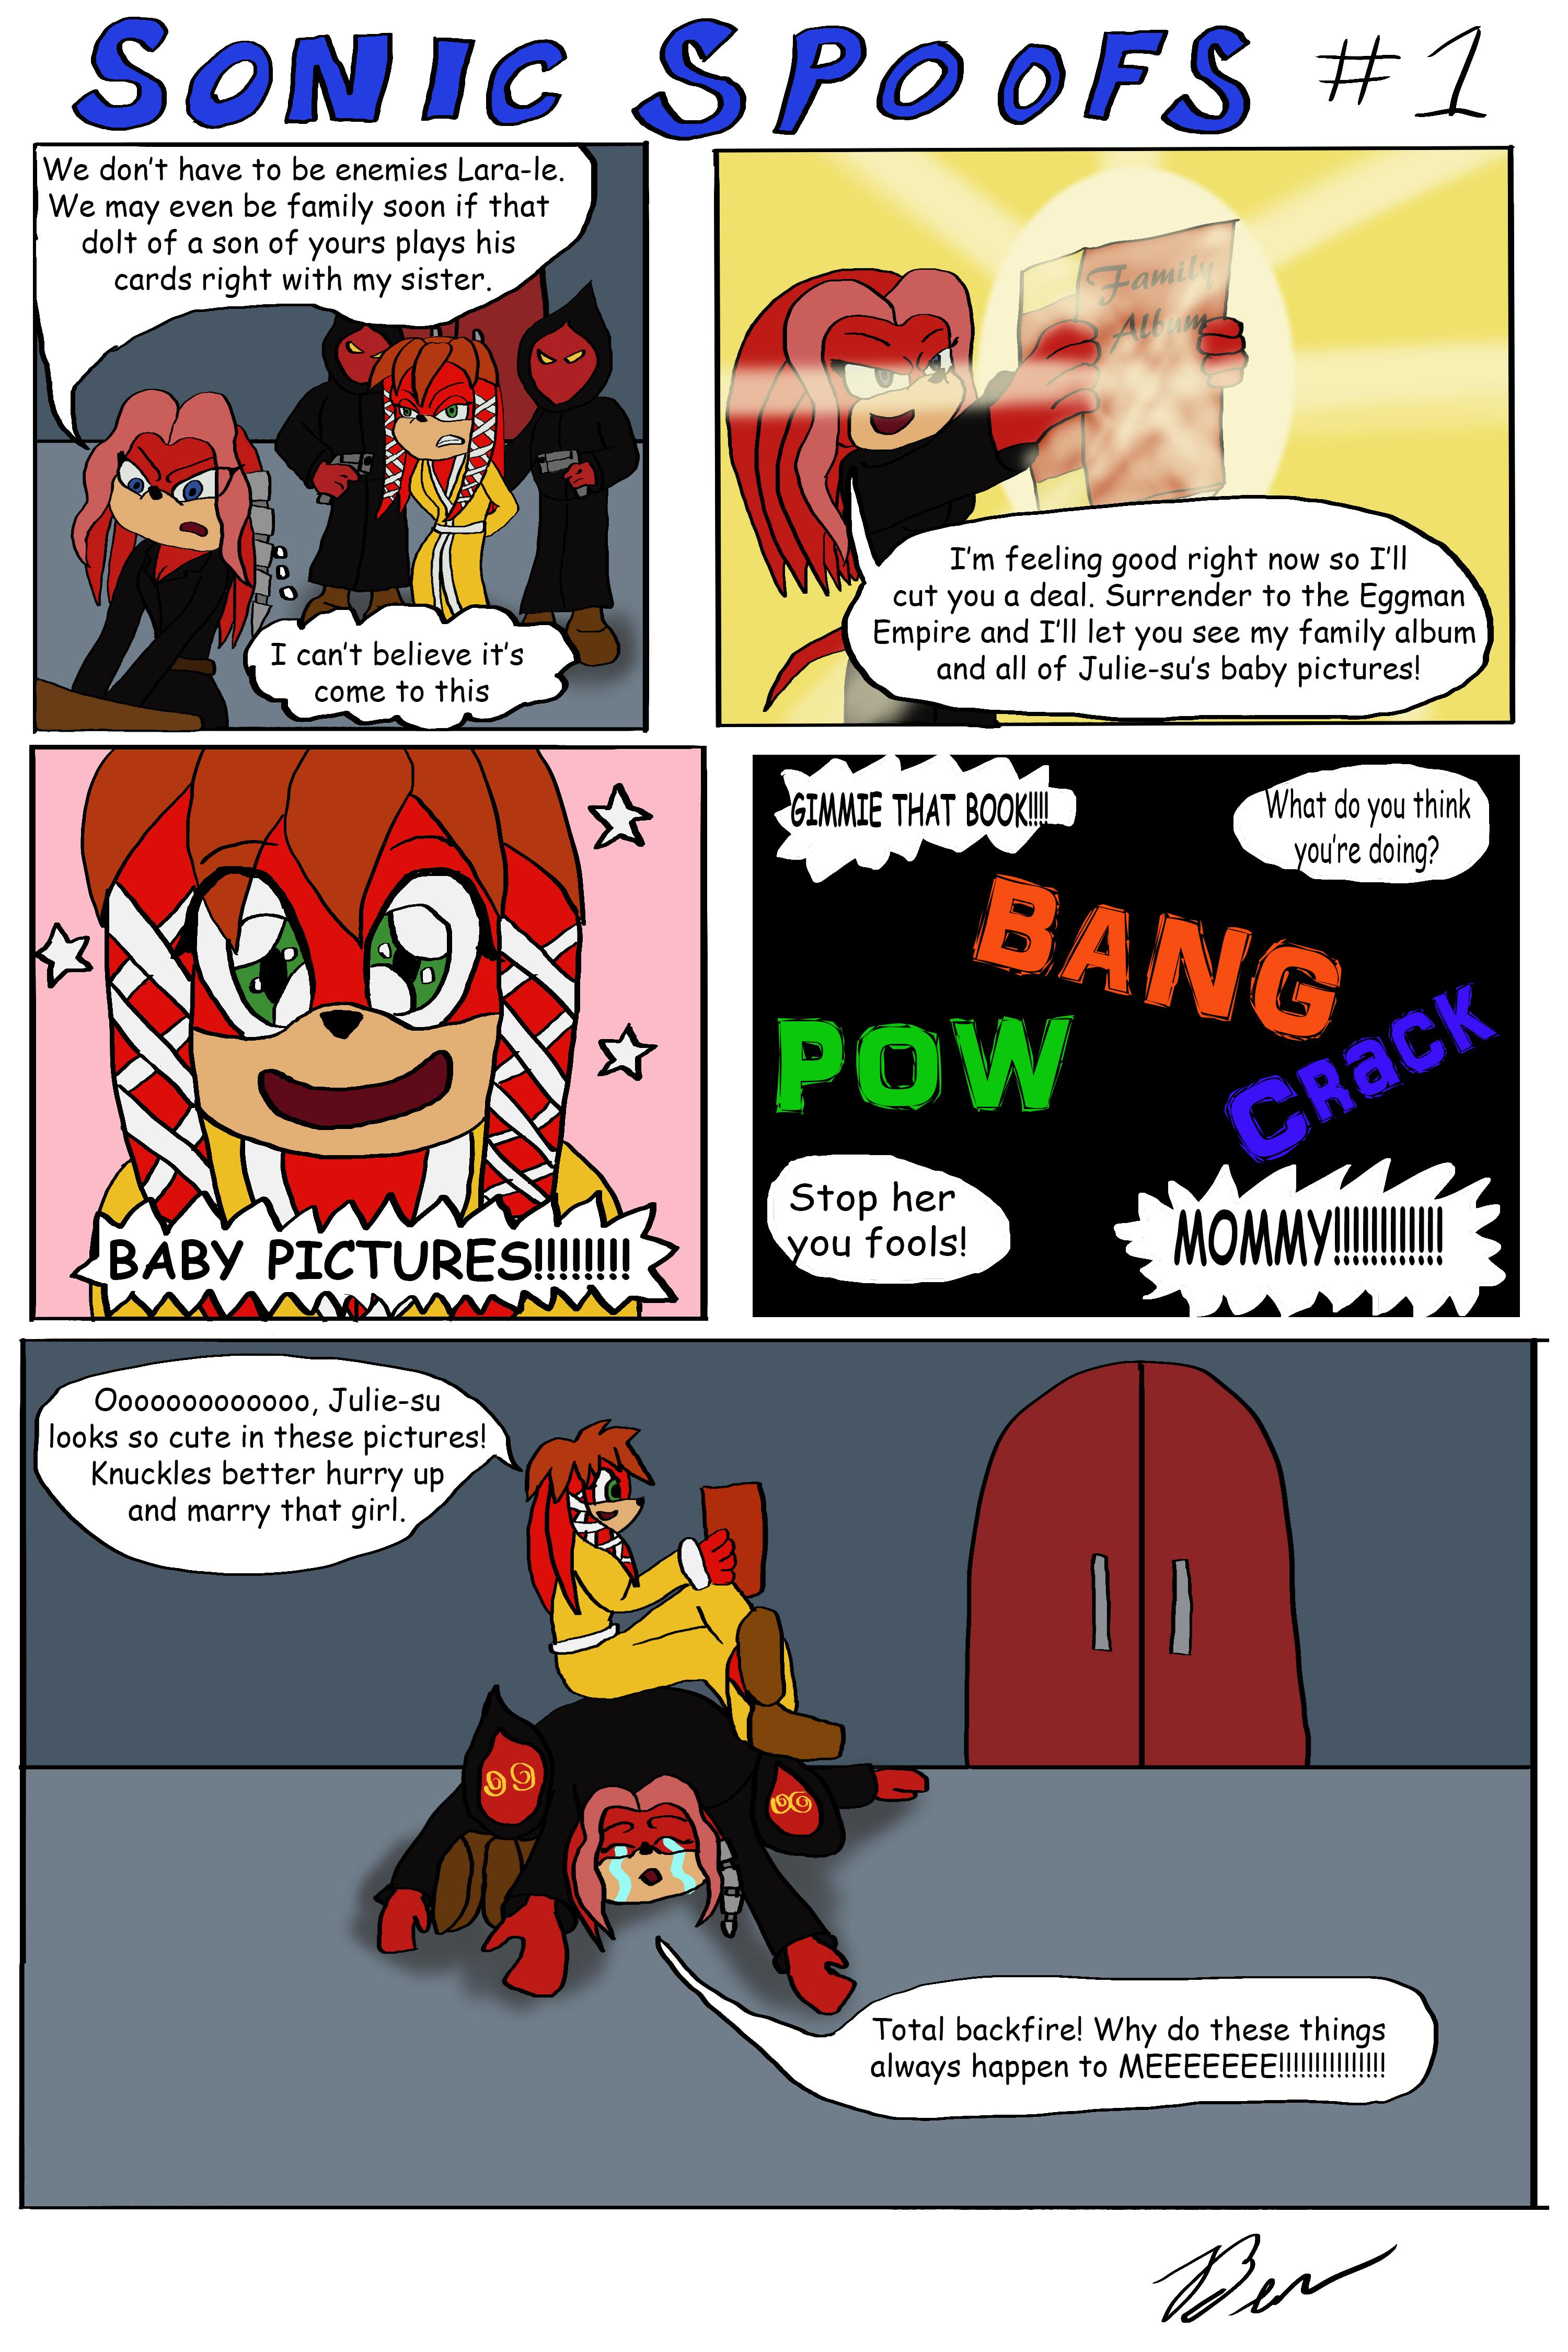 Sonic Spoofs #1